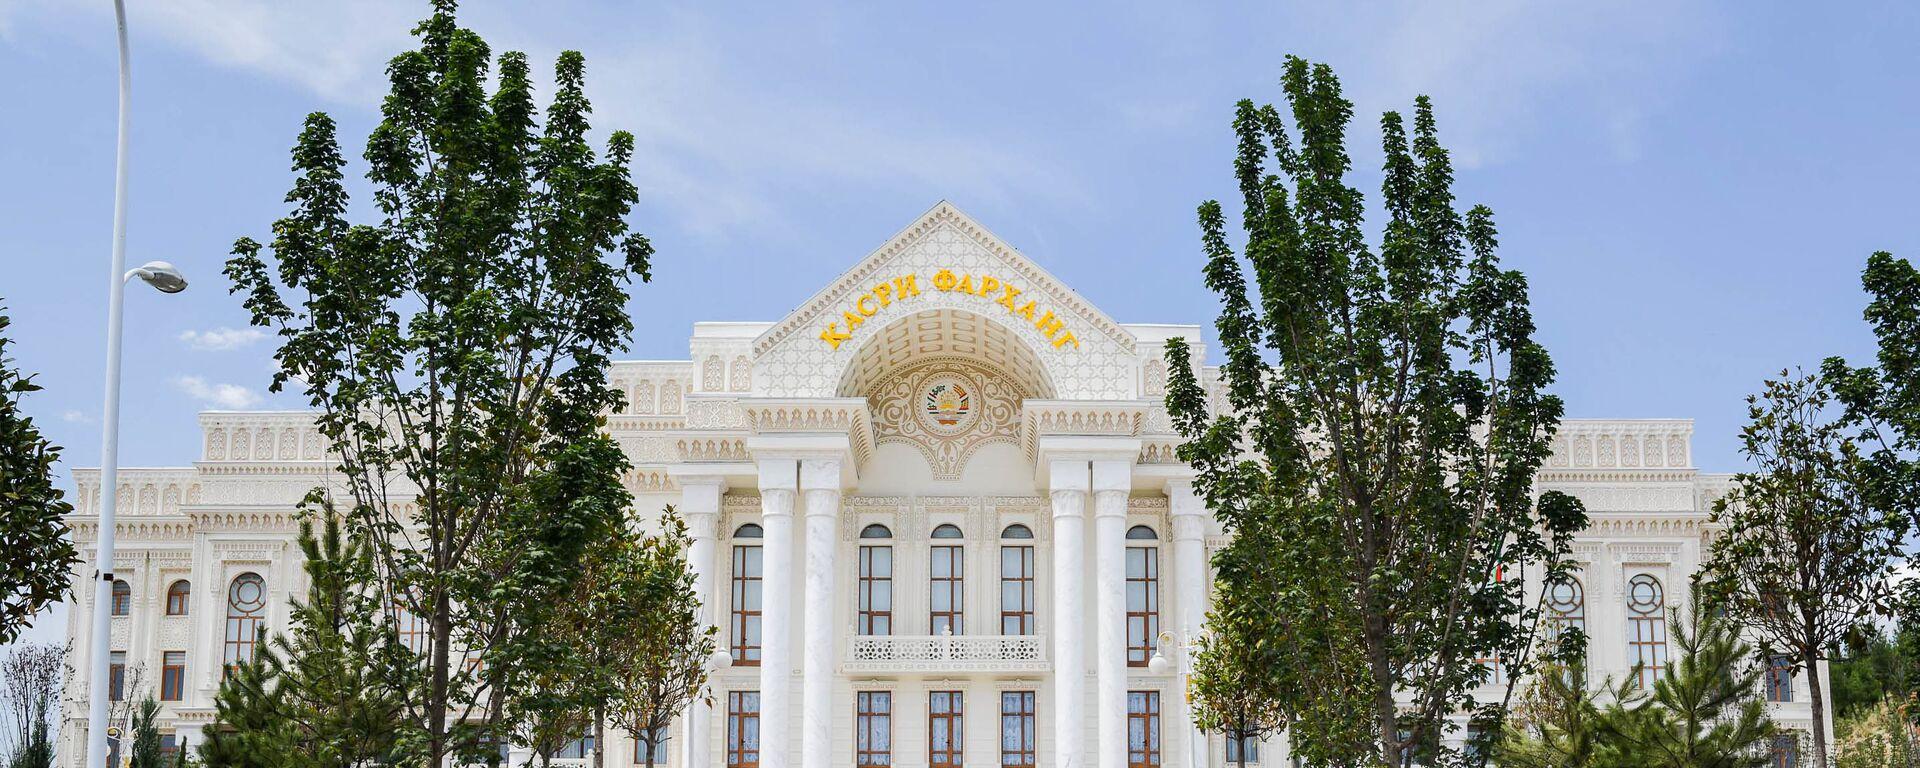 Новый Дворец культуры в Дангаре - Sputnik Таджикистан, 1920, 05.02.2021